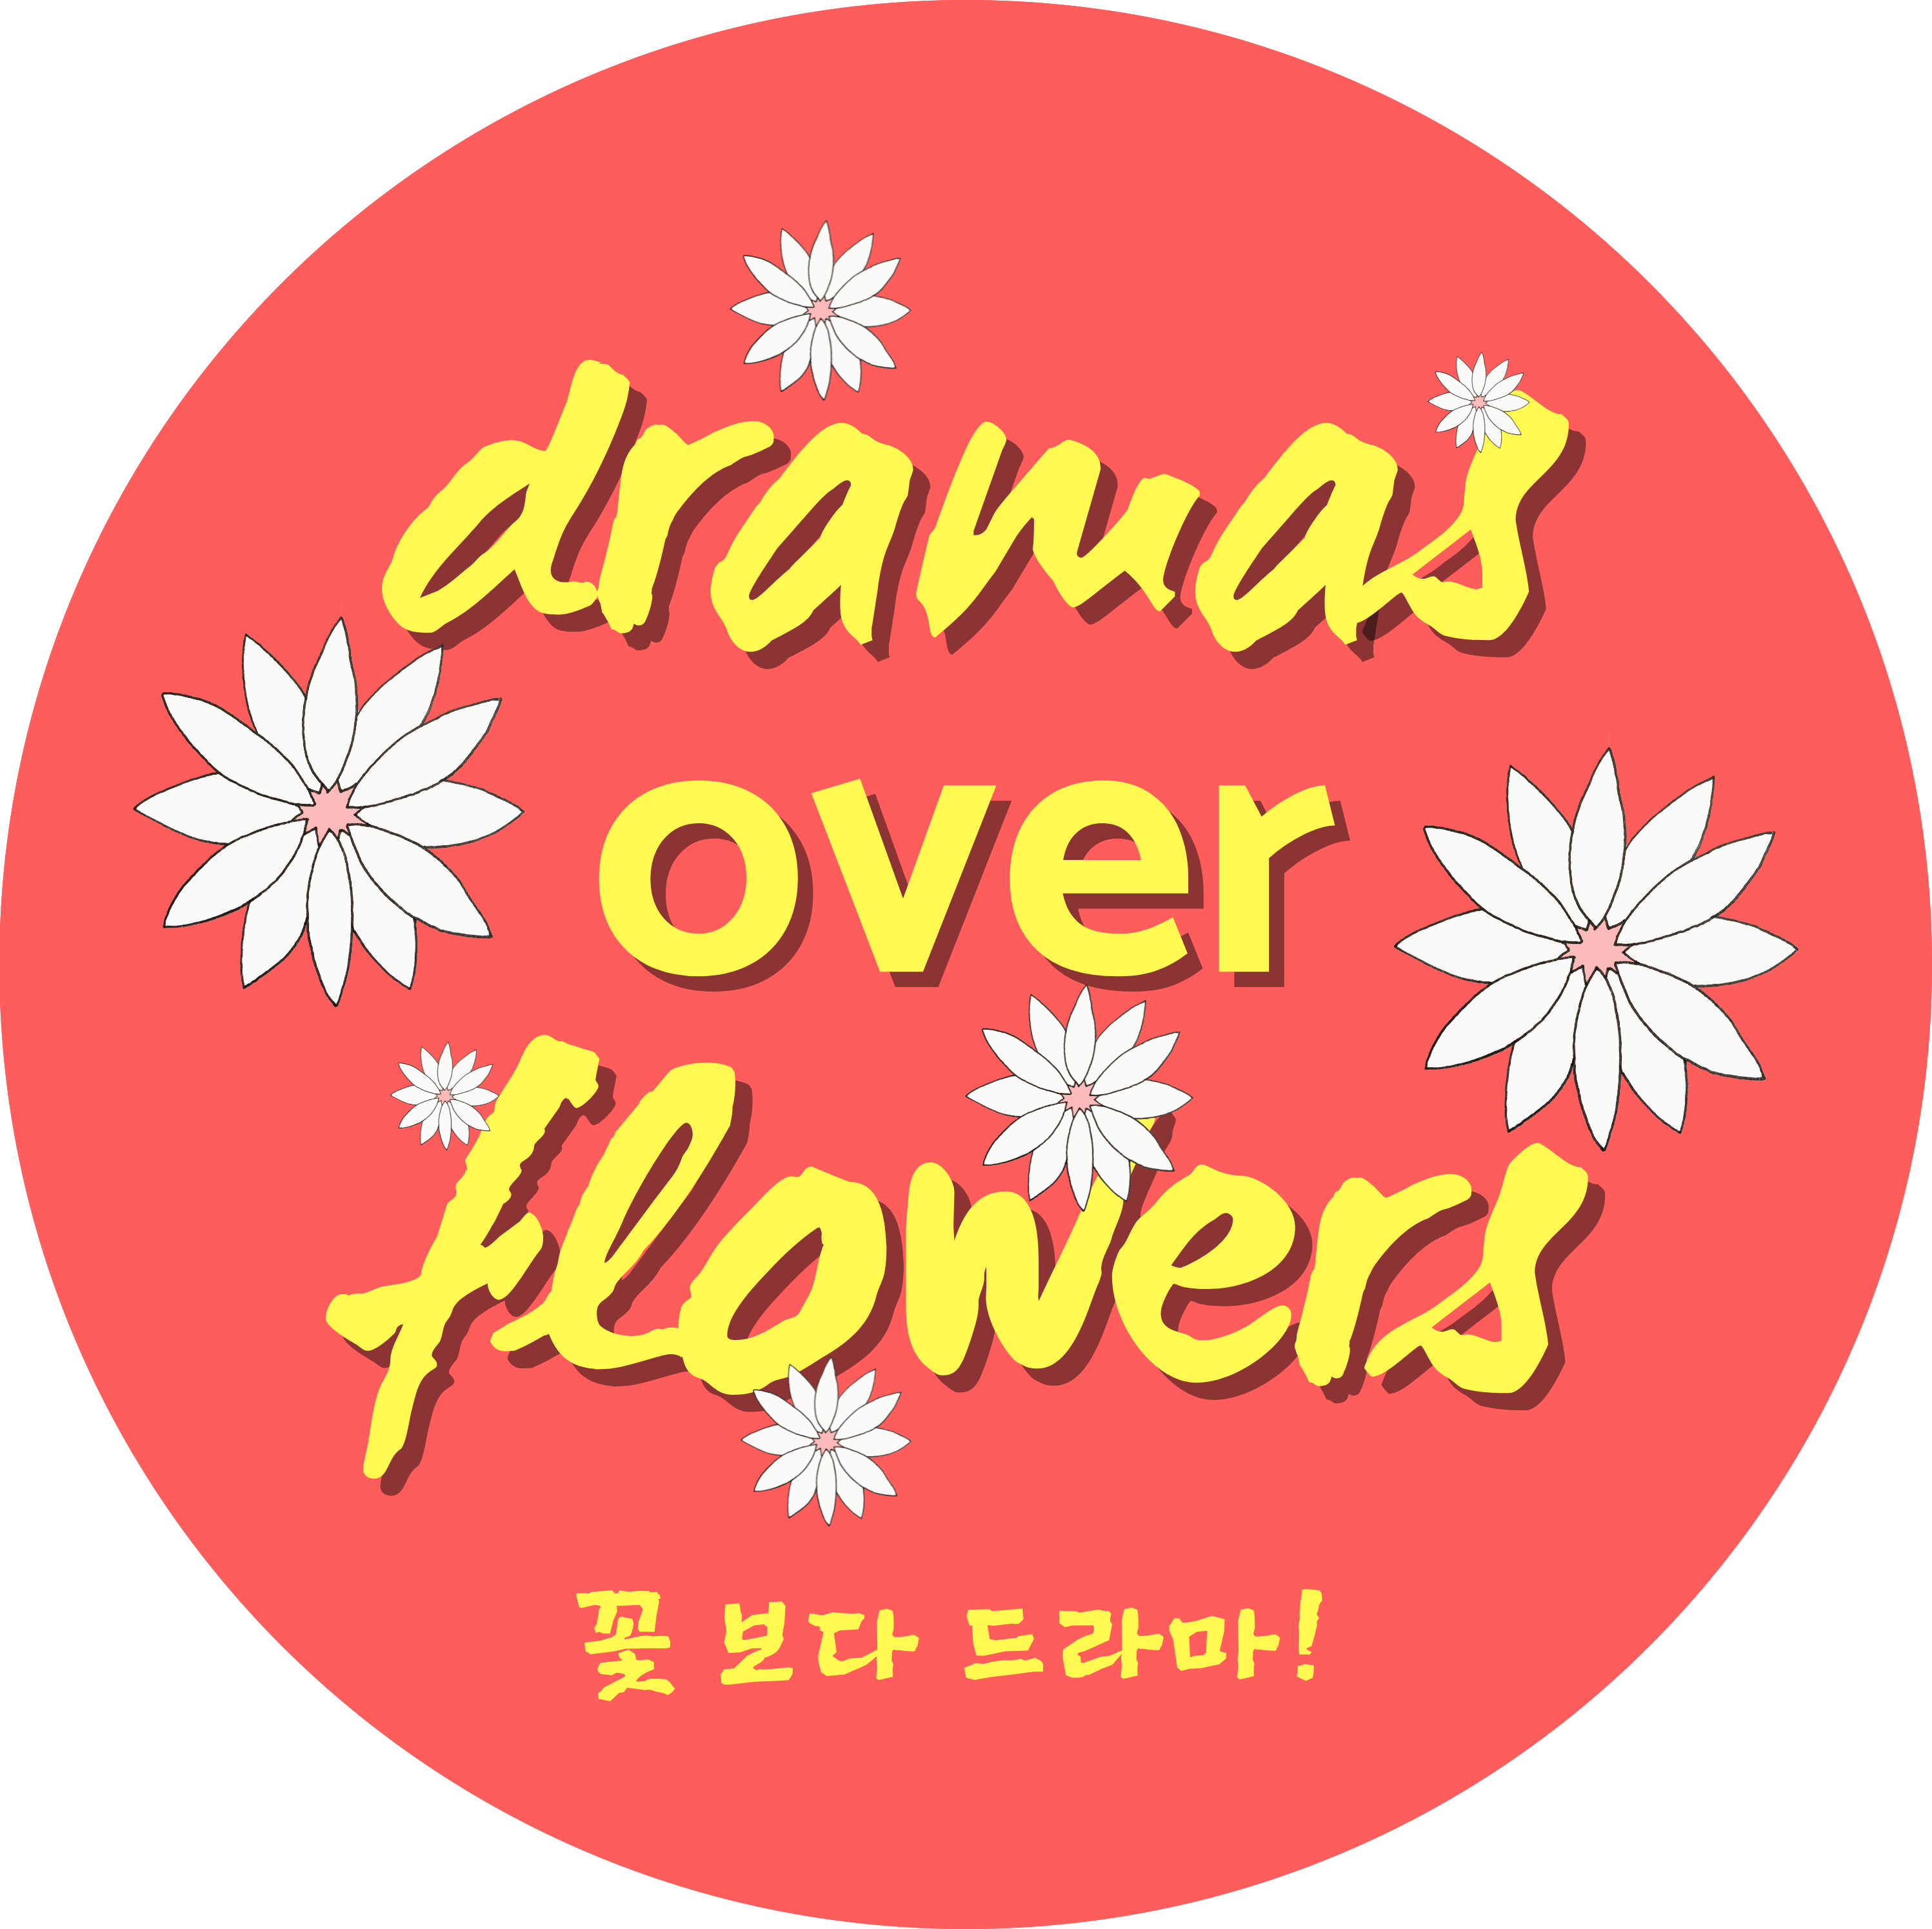 Dramas Over Flowers